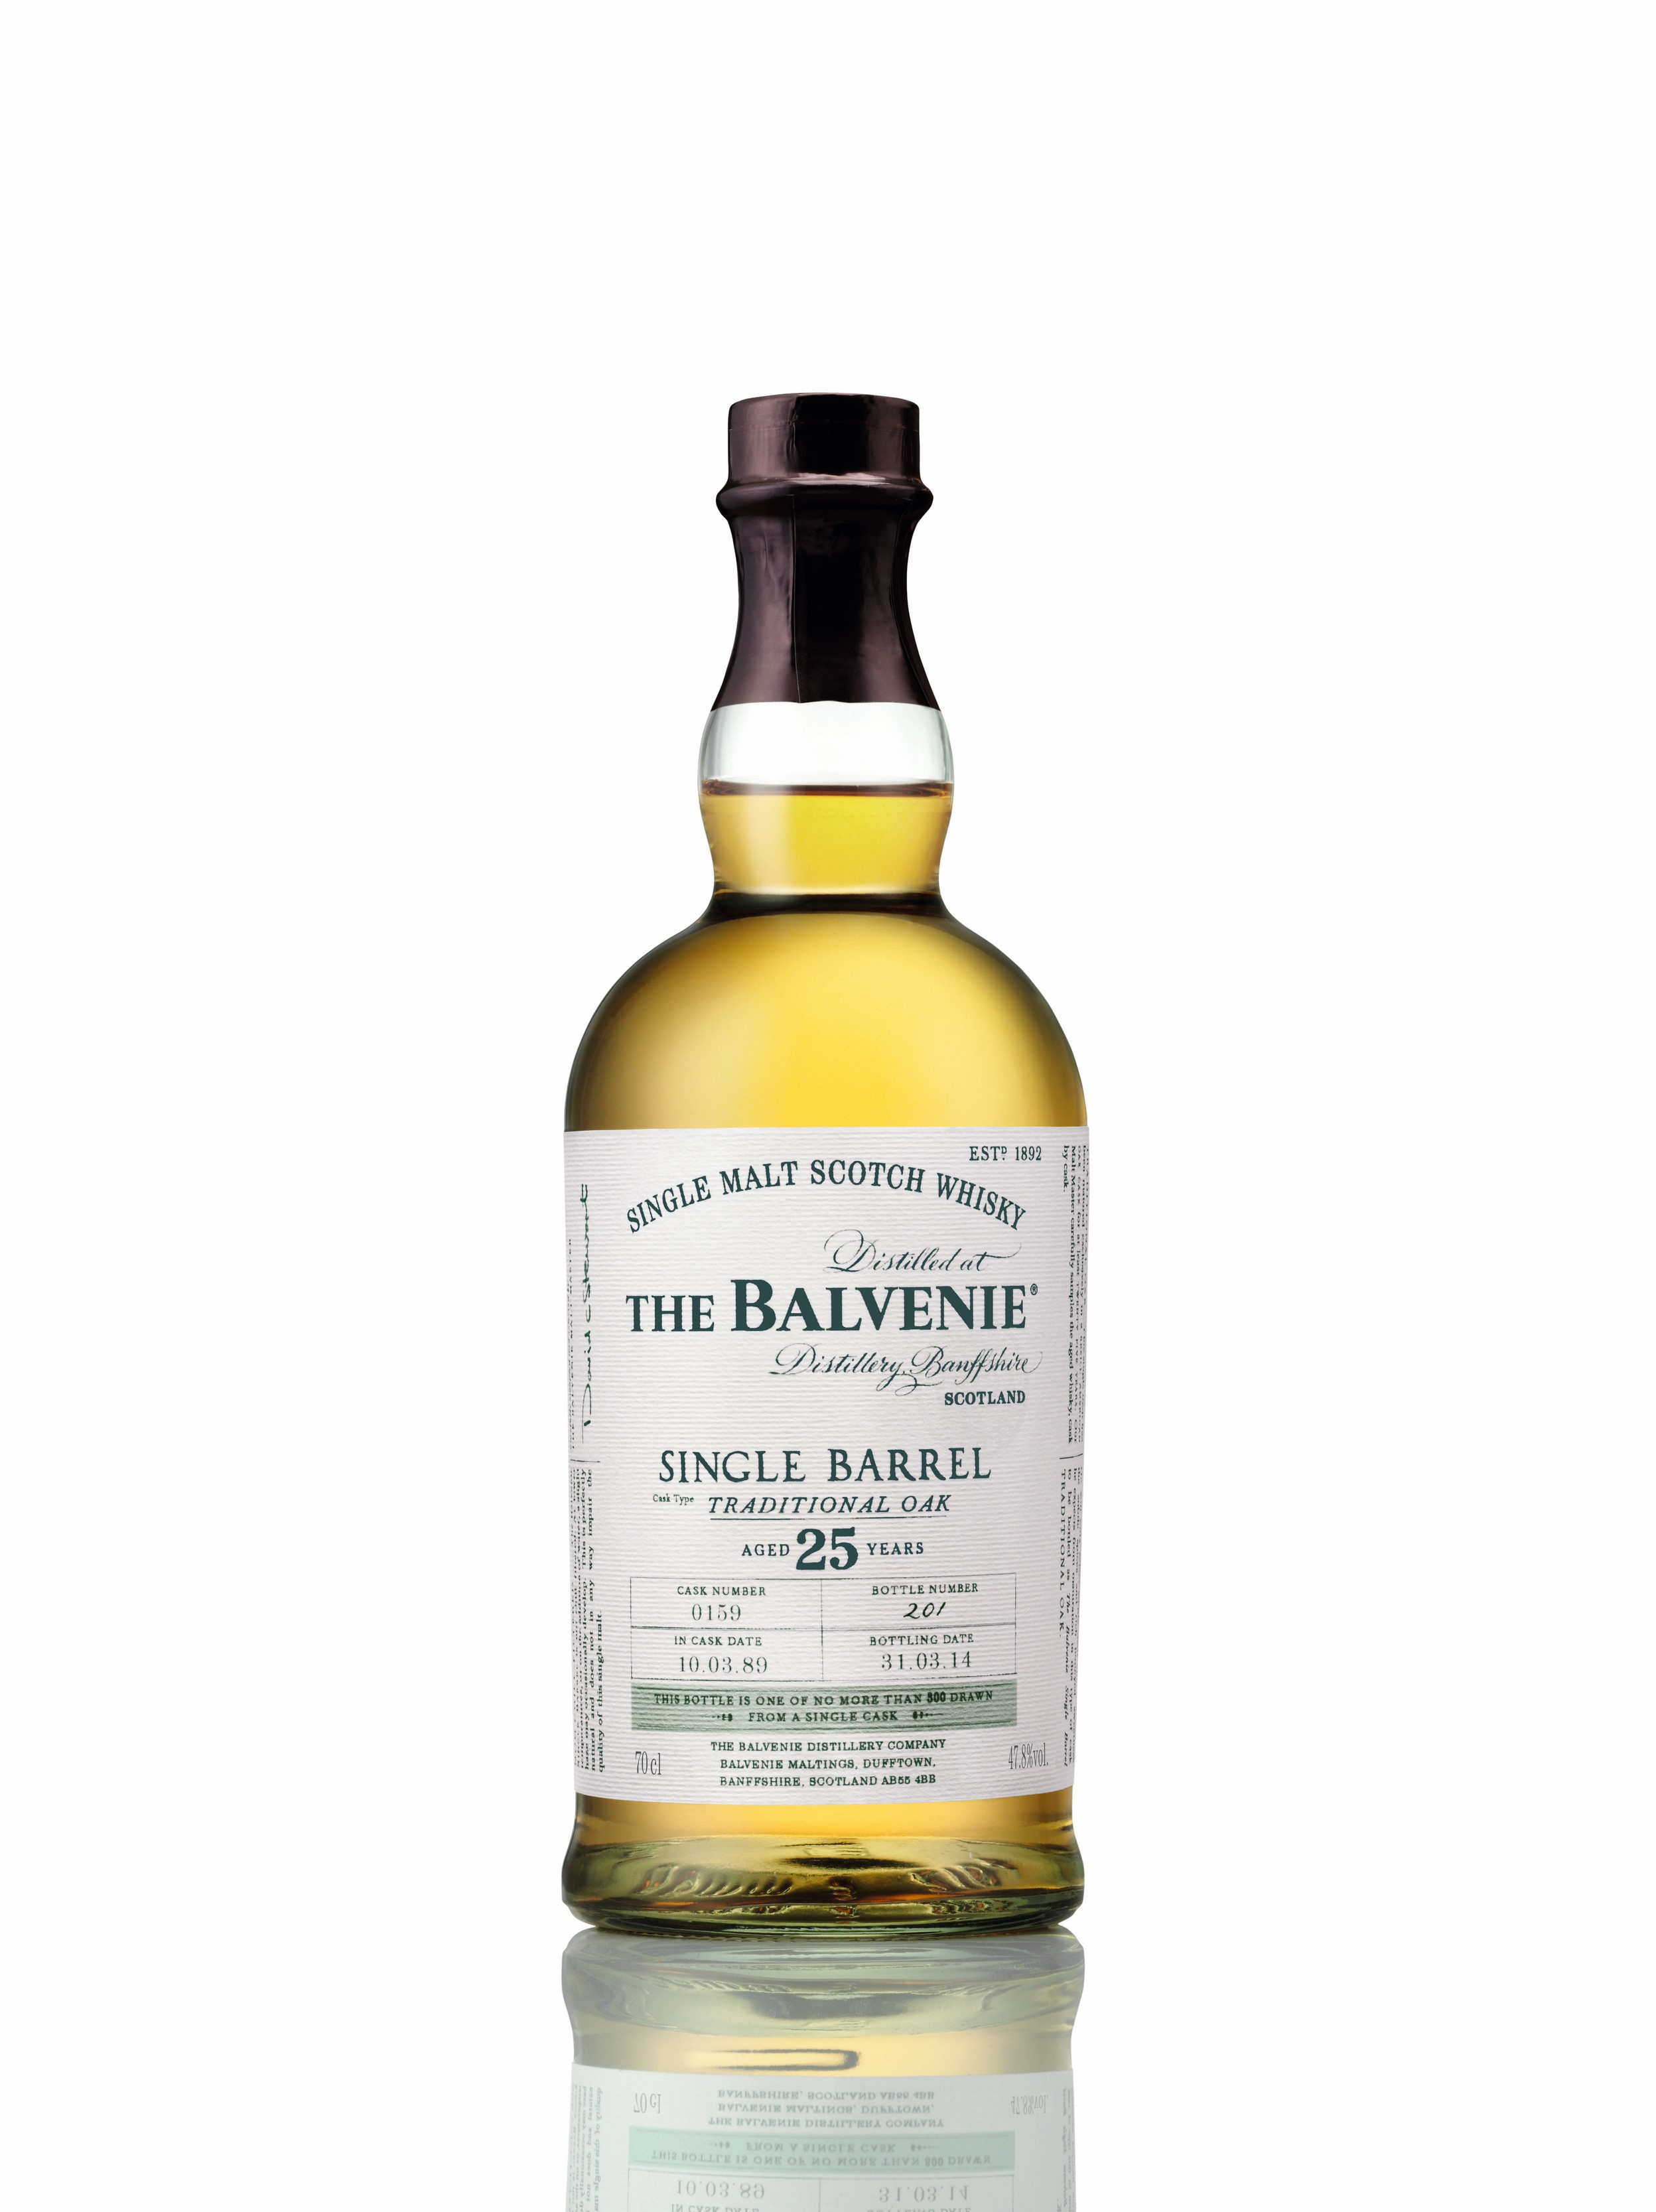 Balvenie single barrel traditional oak 25